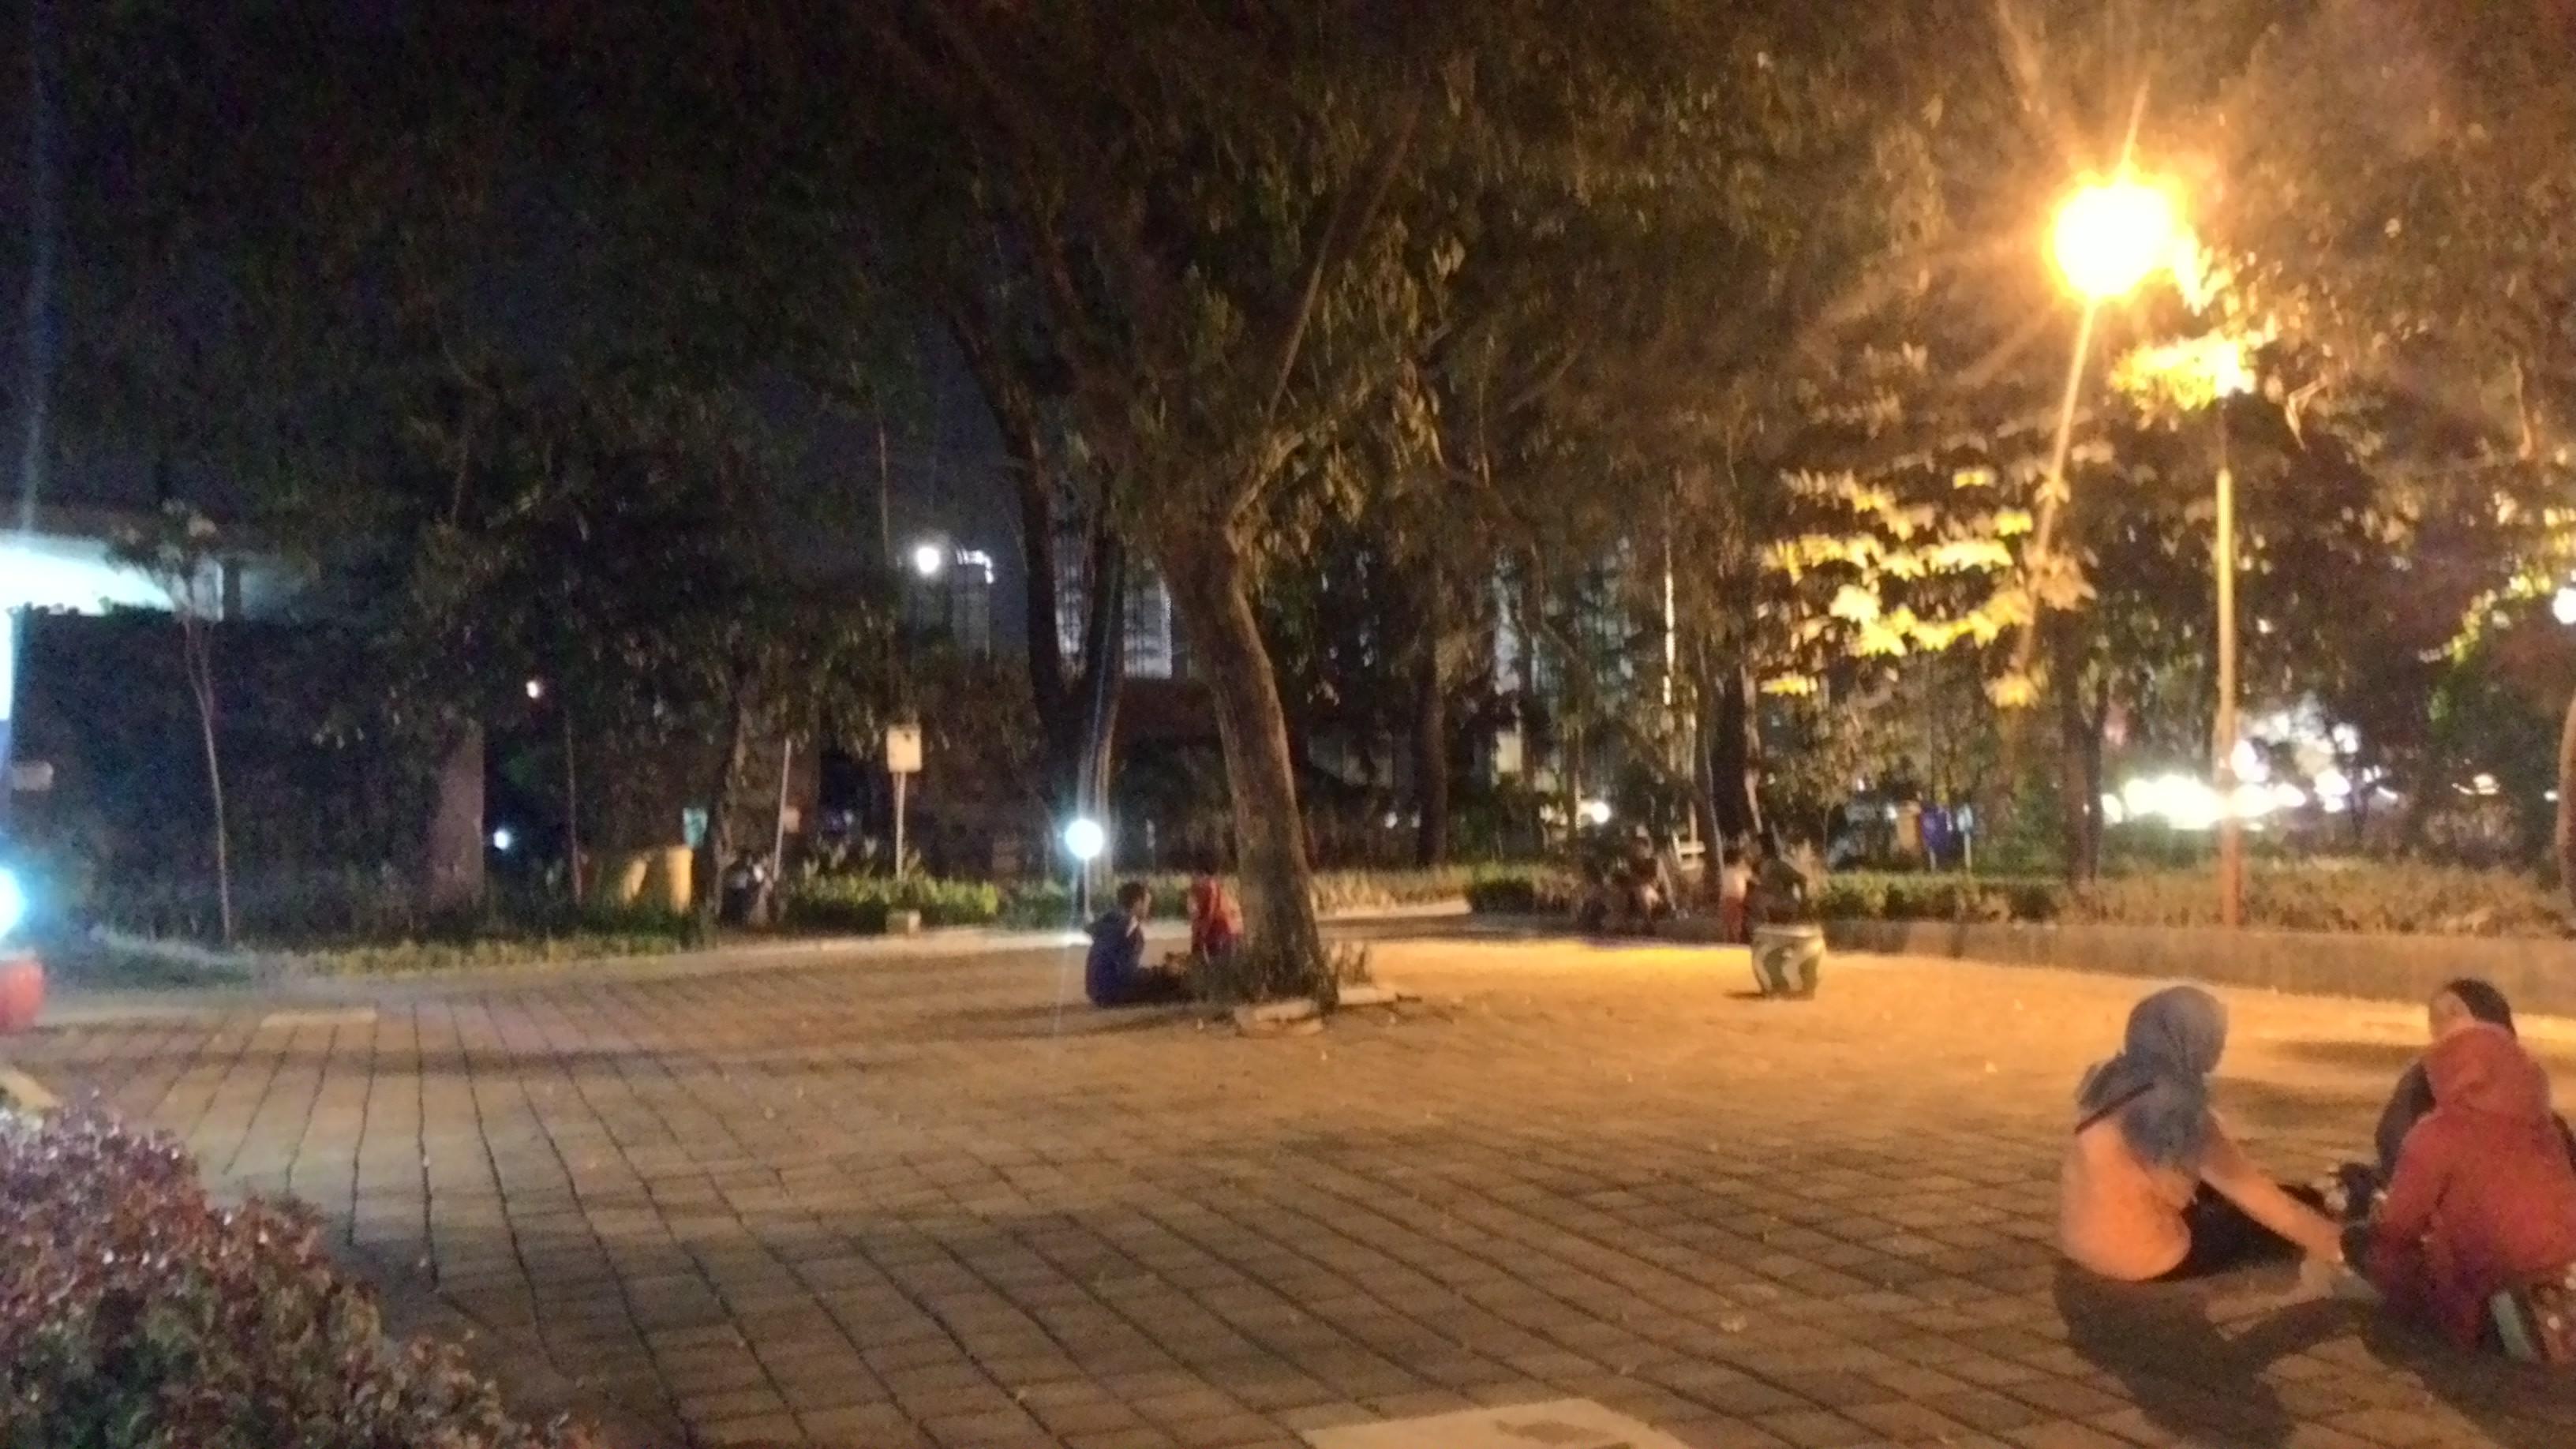 Wisata Kota Taman Pelangi Surabaya Oleh Find Leilla Lesehan Dok